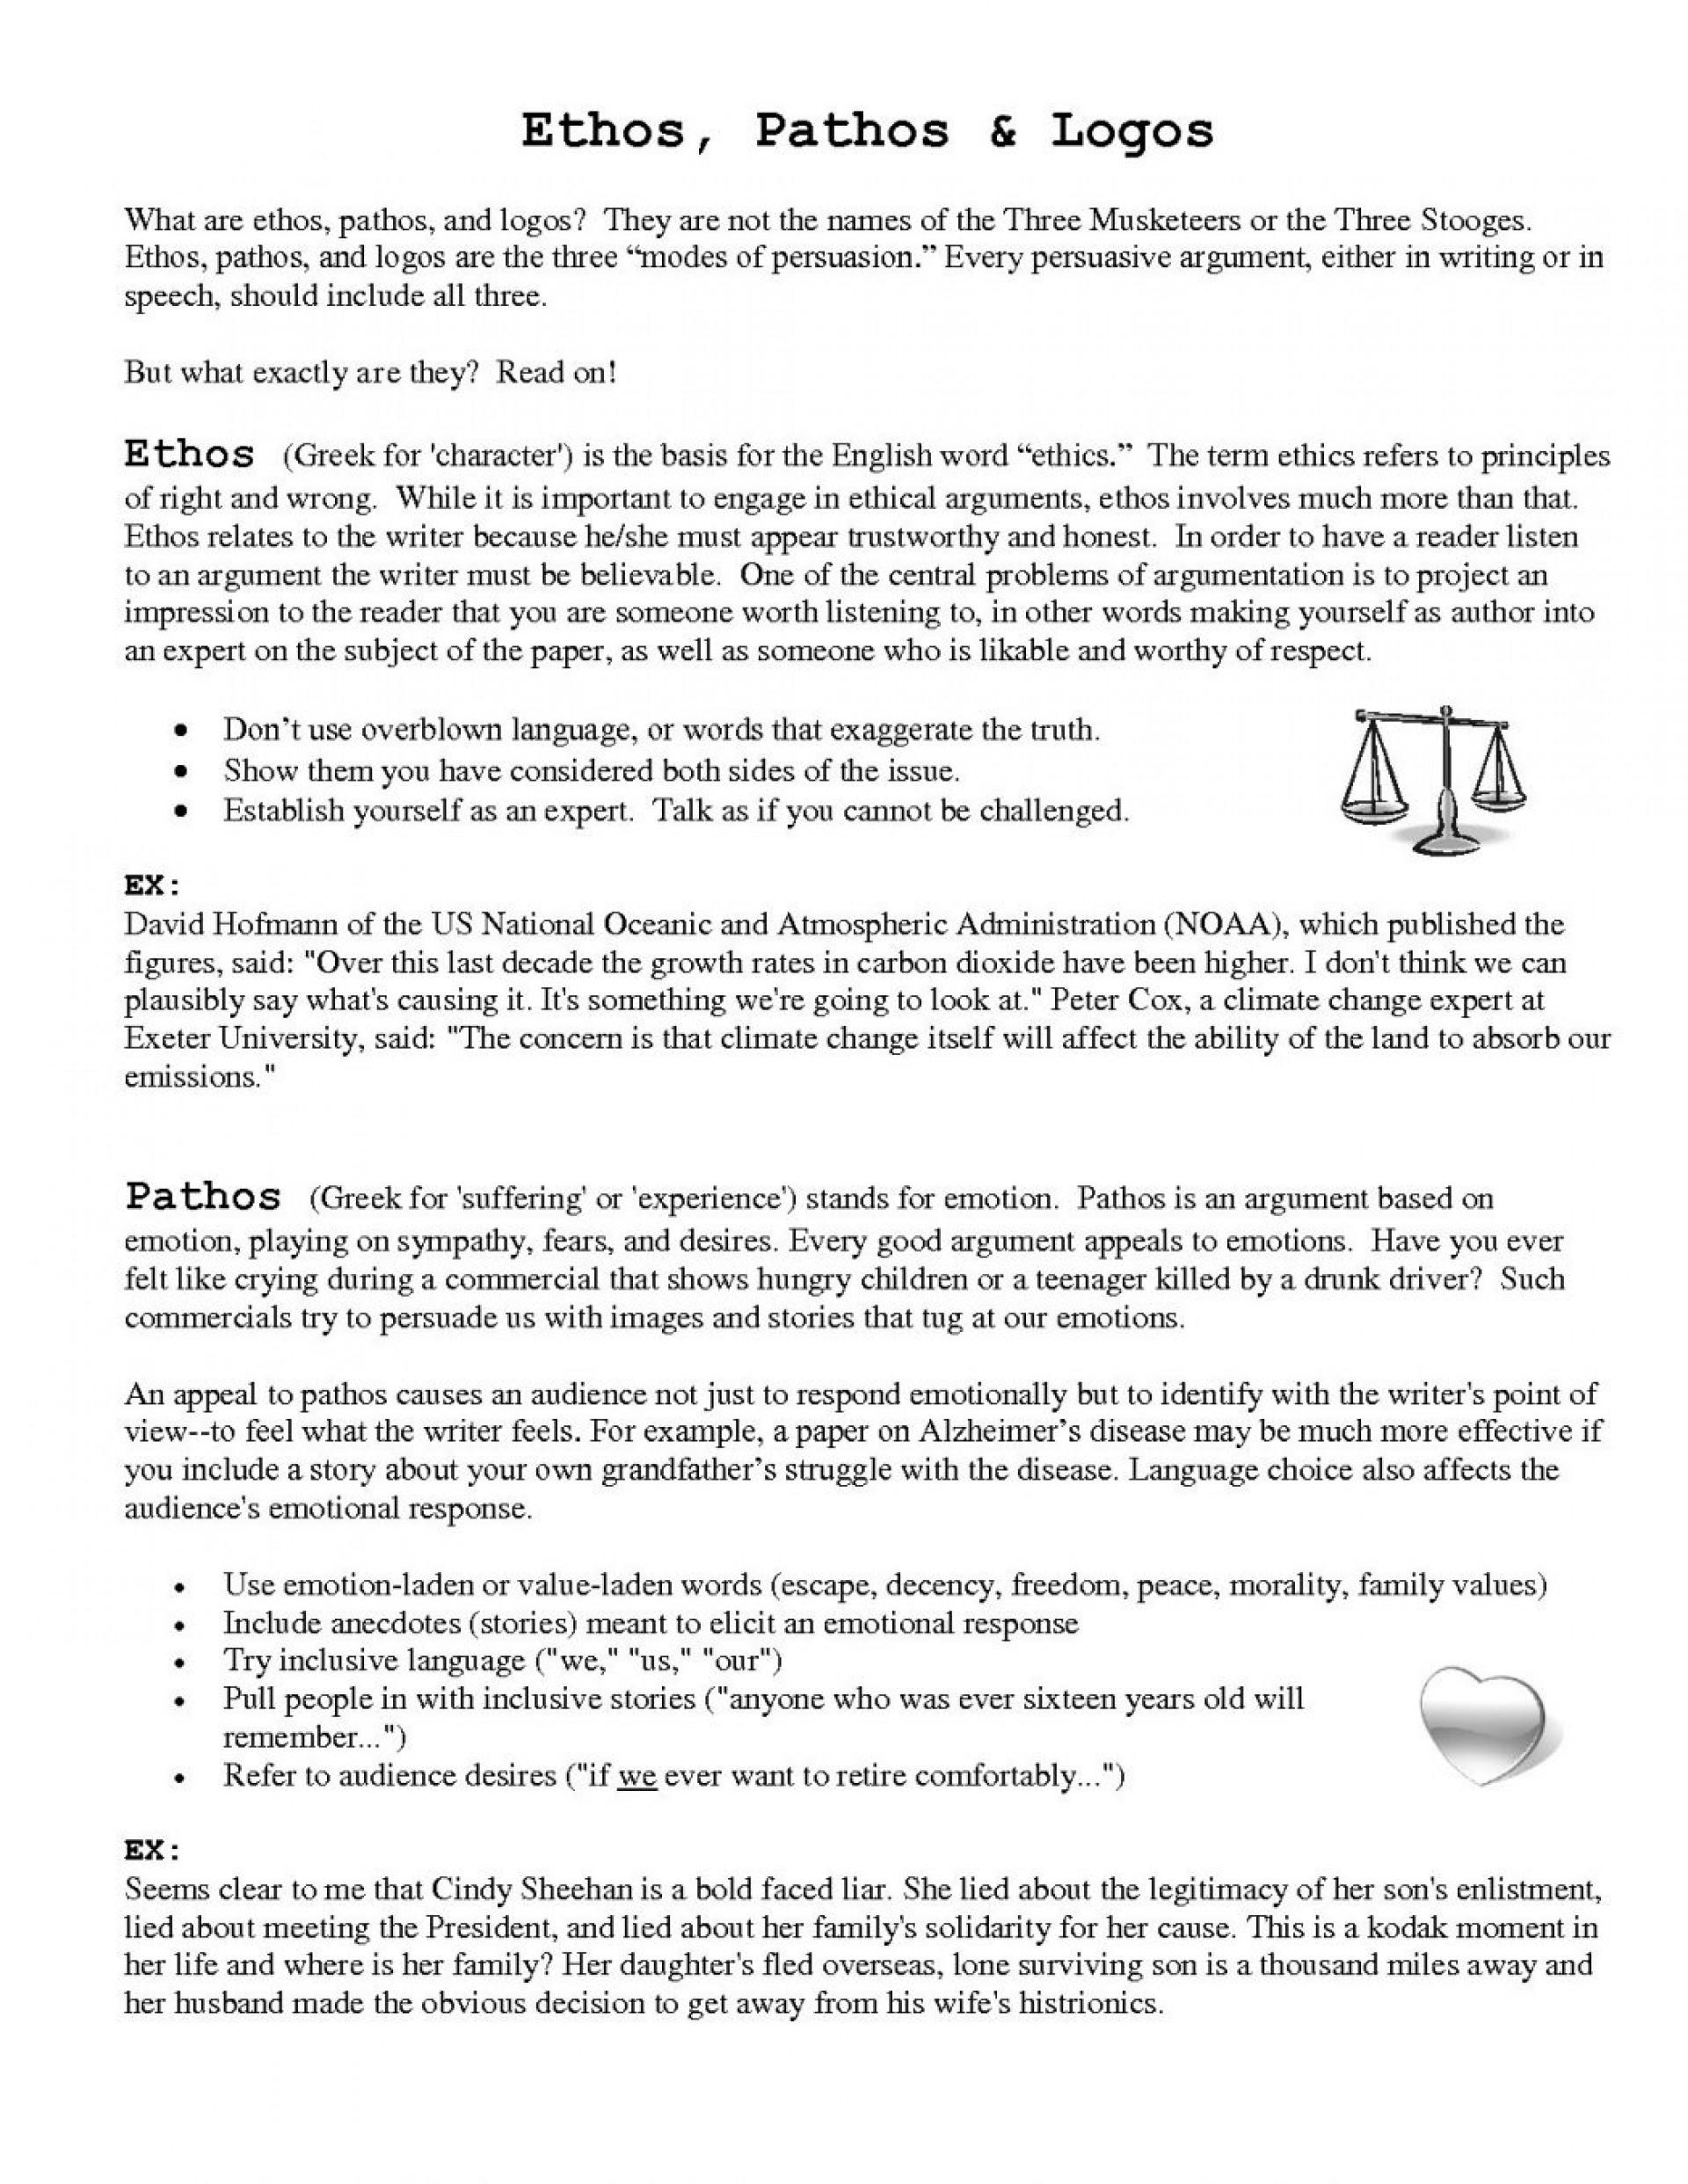 017 Essayxamplethos Pathos Logos For School Pinterestnglish And Of Rhetorical Analysis Using Pdf 1048x1356 Letter From Birmingham Jail Top Ethos Essay 1920